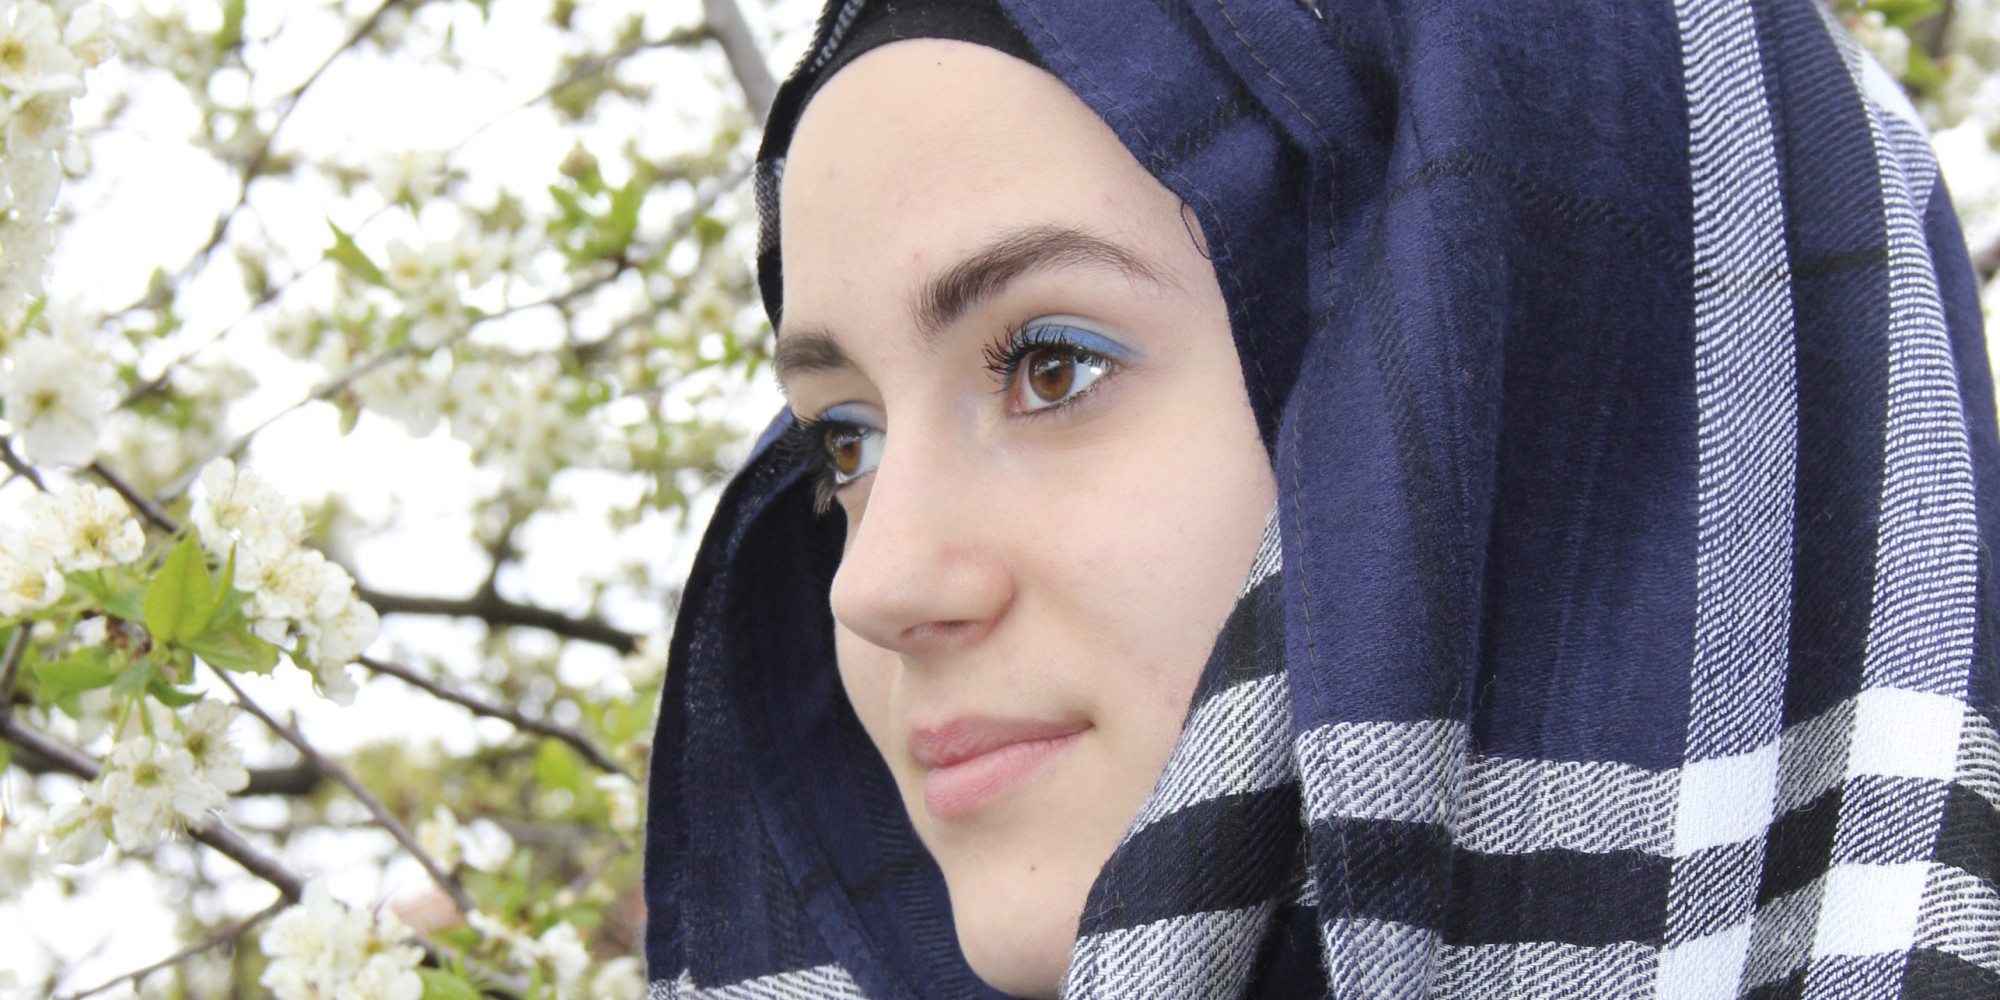 Image For Love - Muslim Girls In France - HD Wallpaper